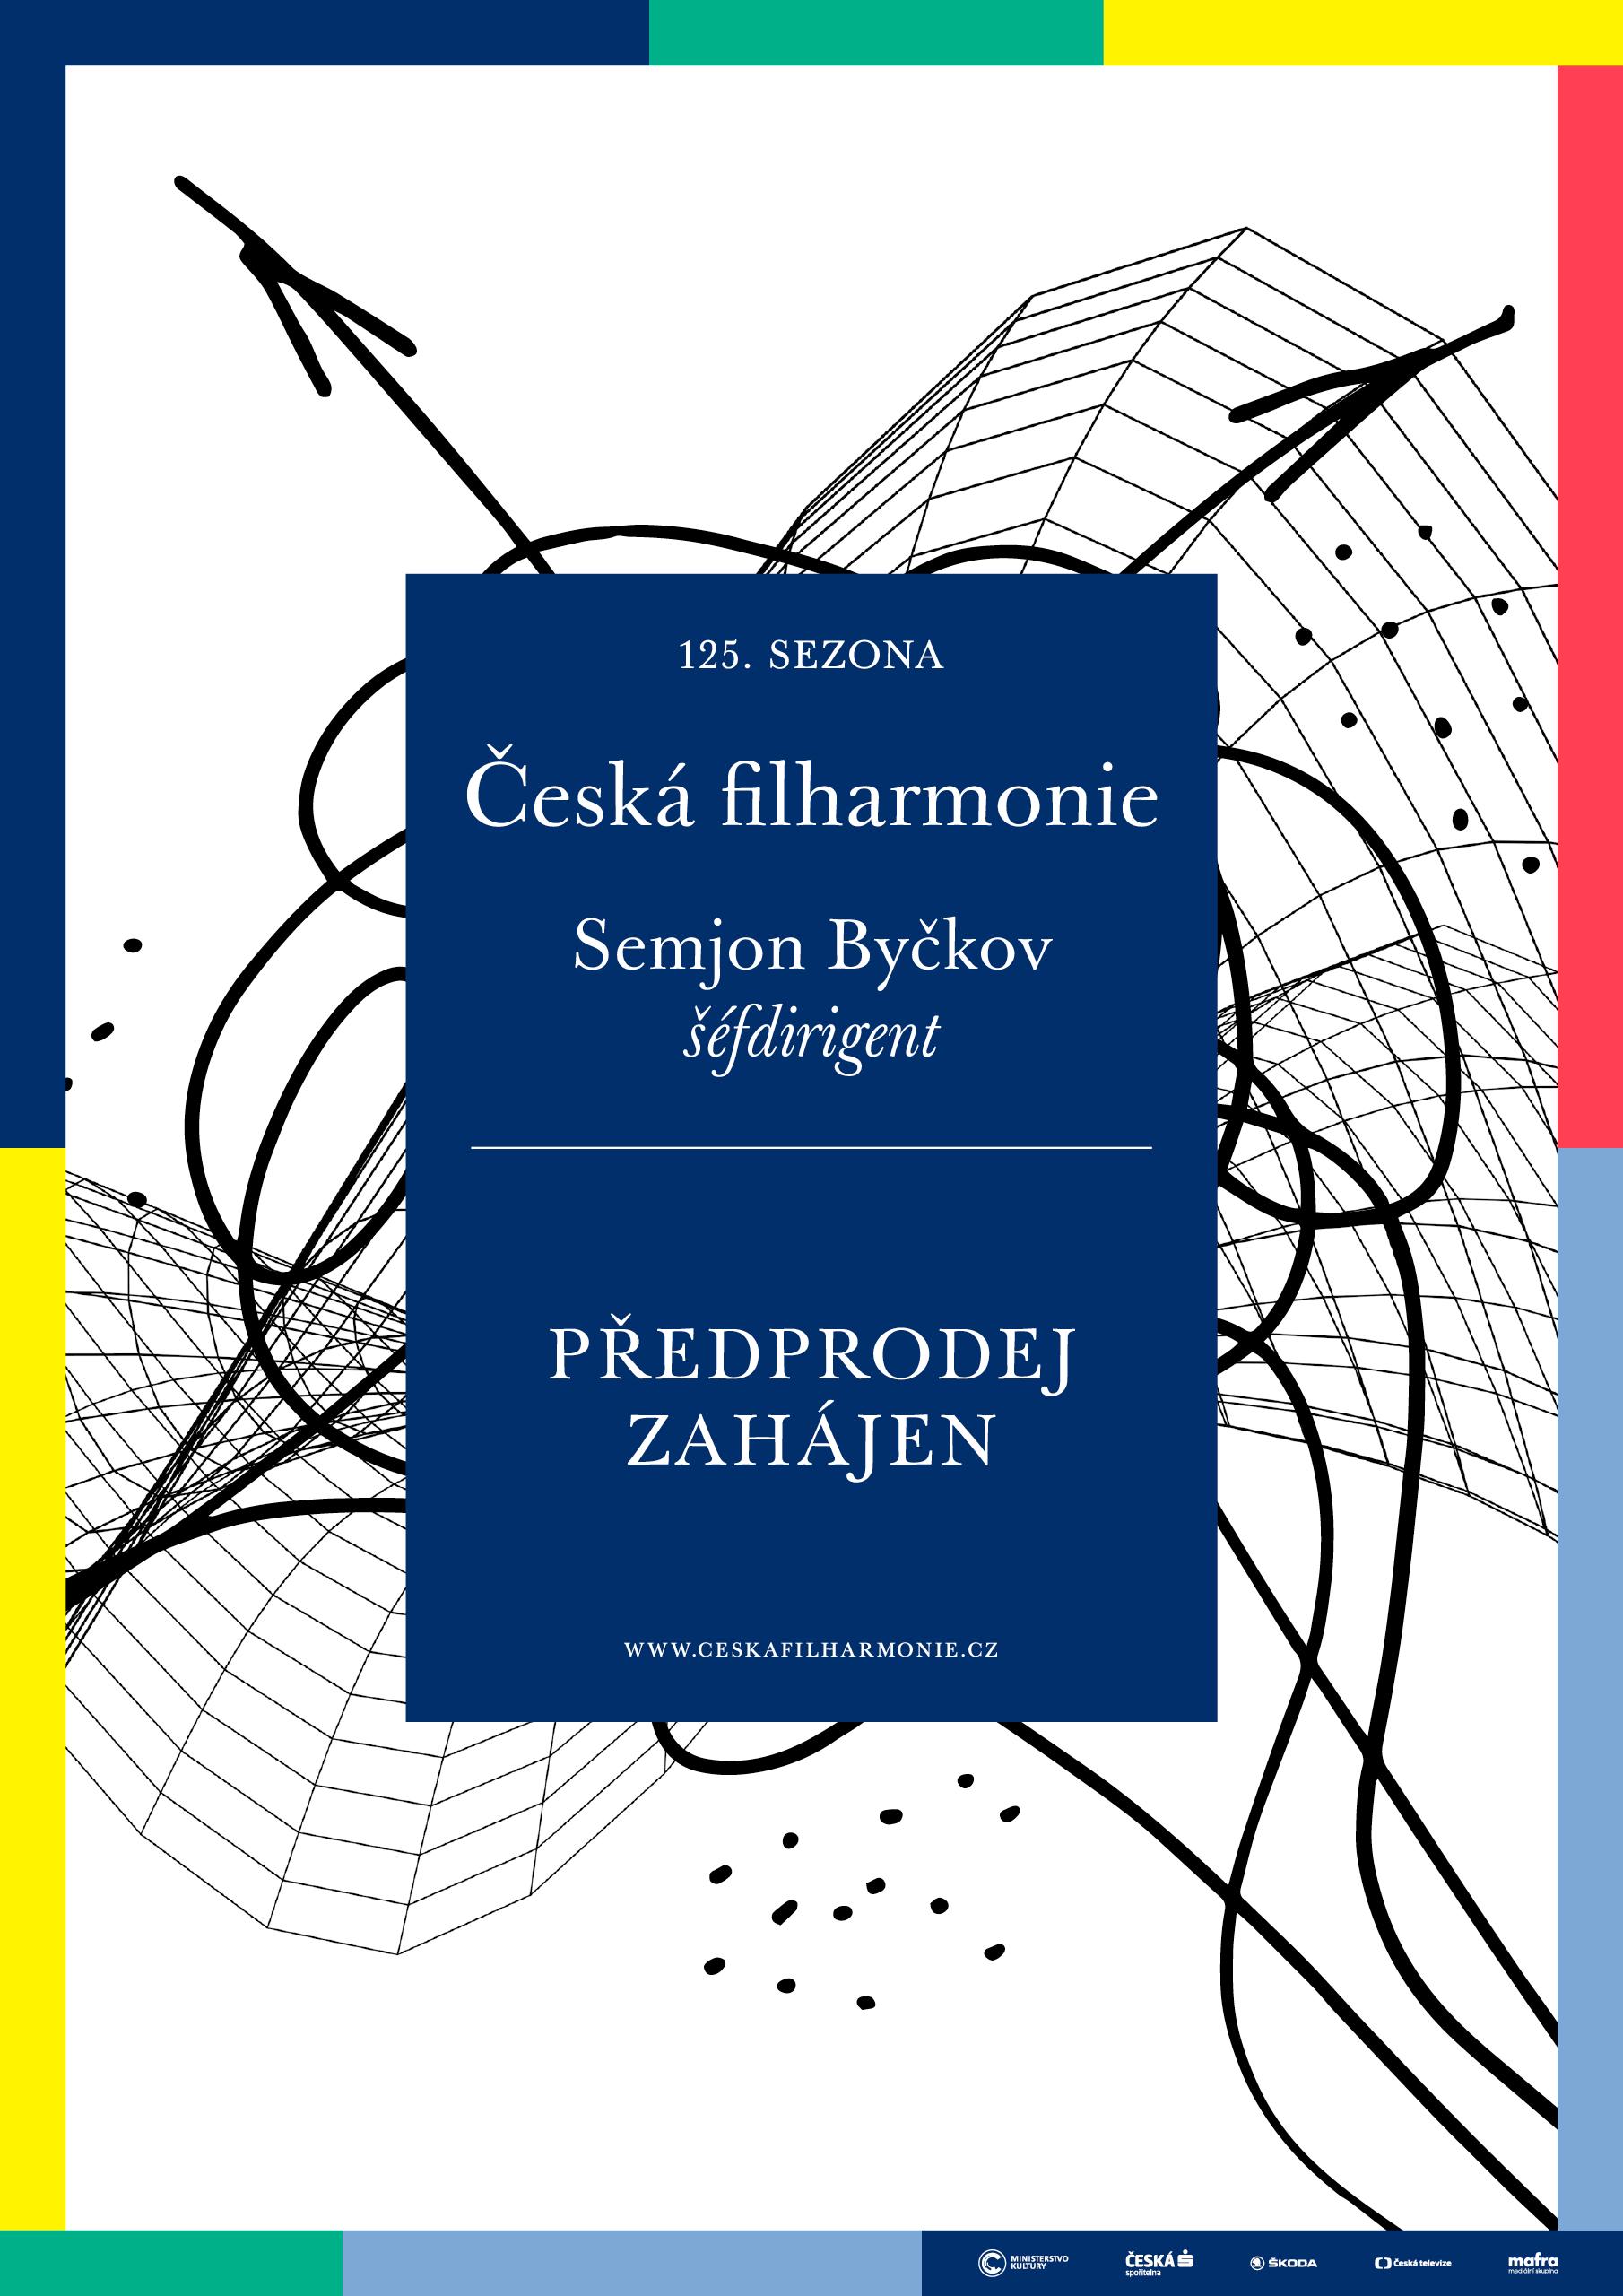 The Czech Philharmonic 2020/2021